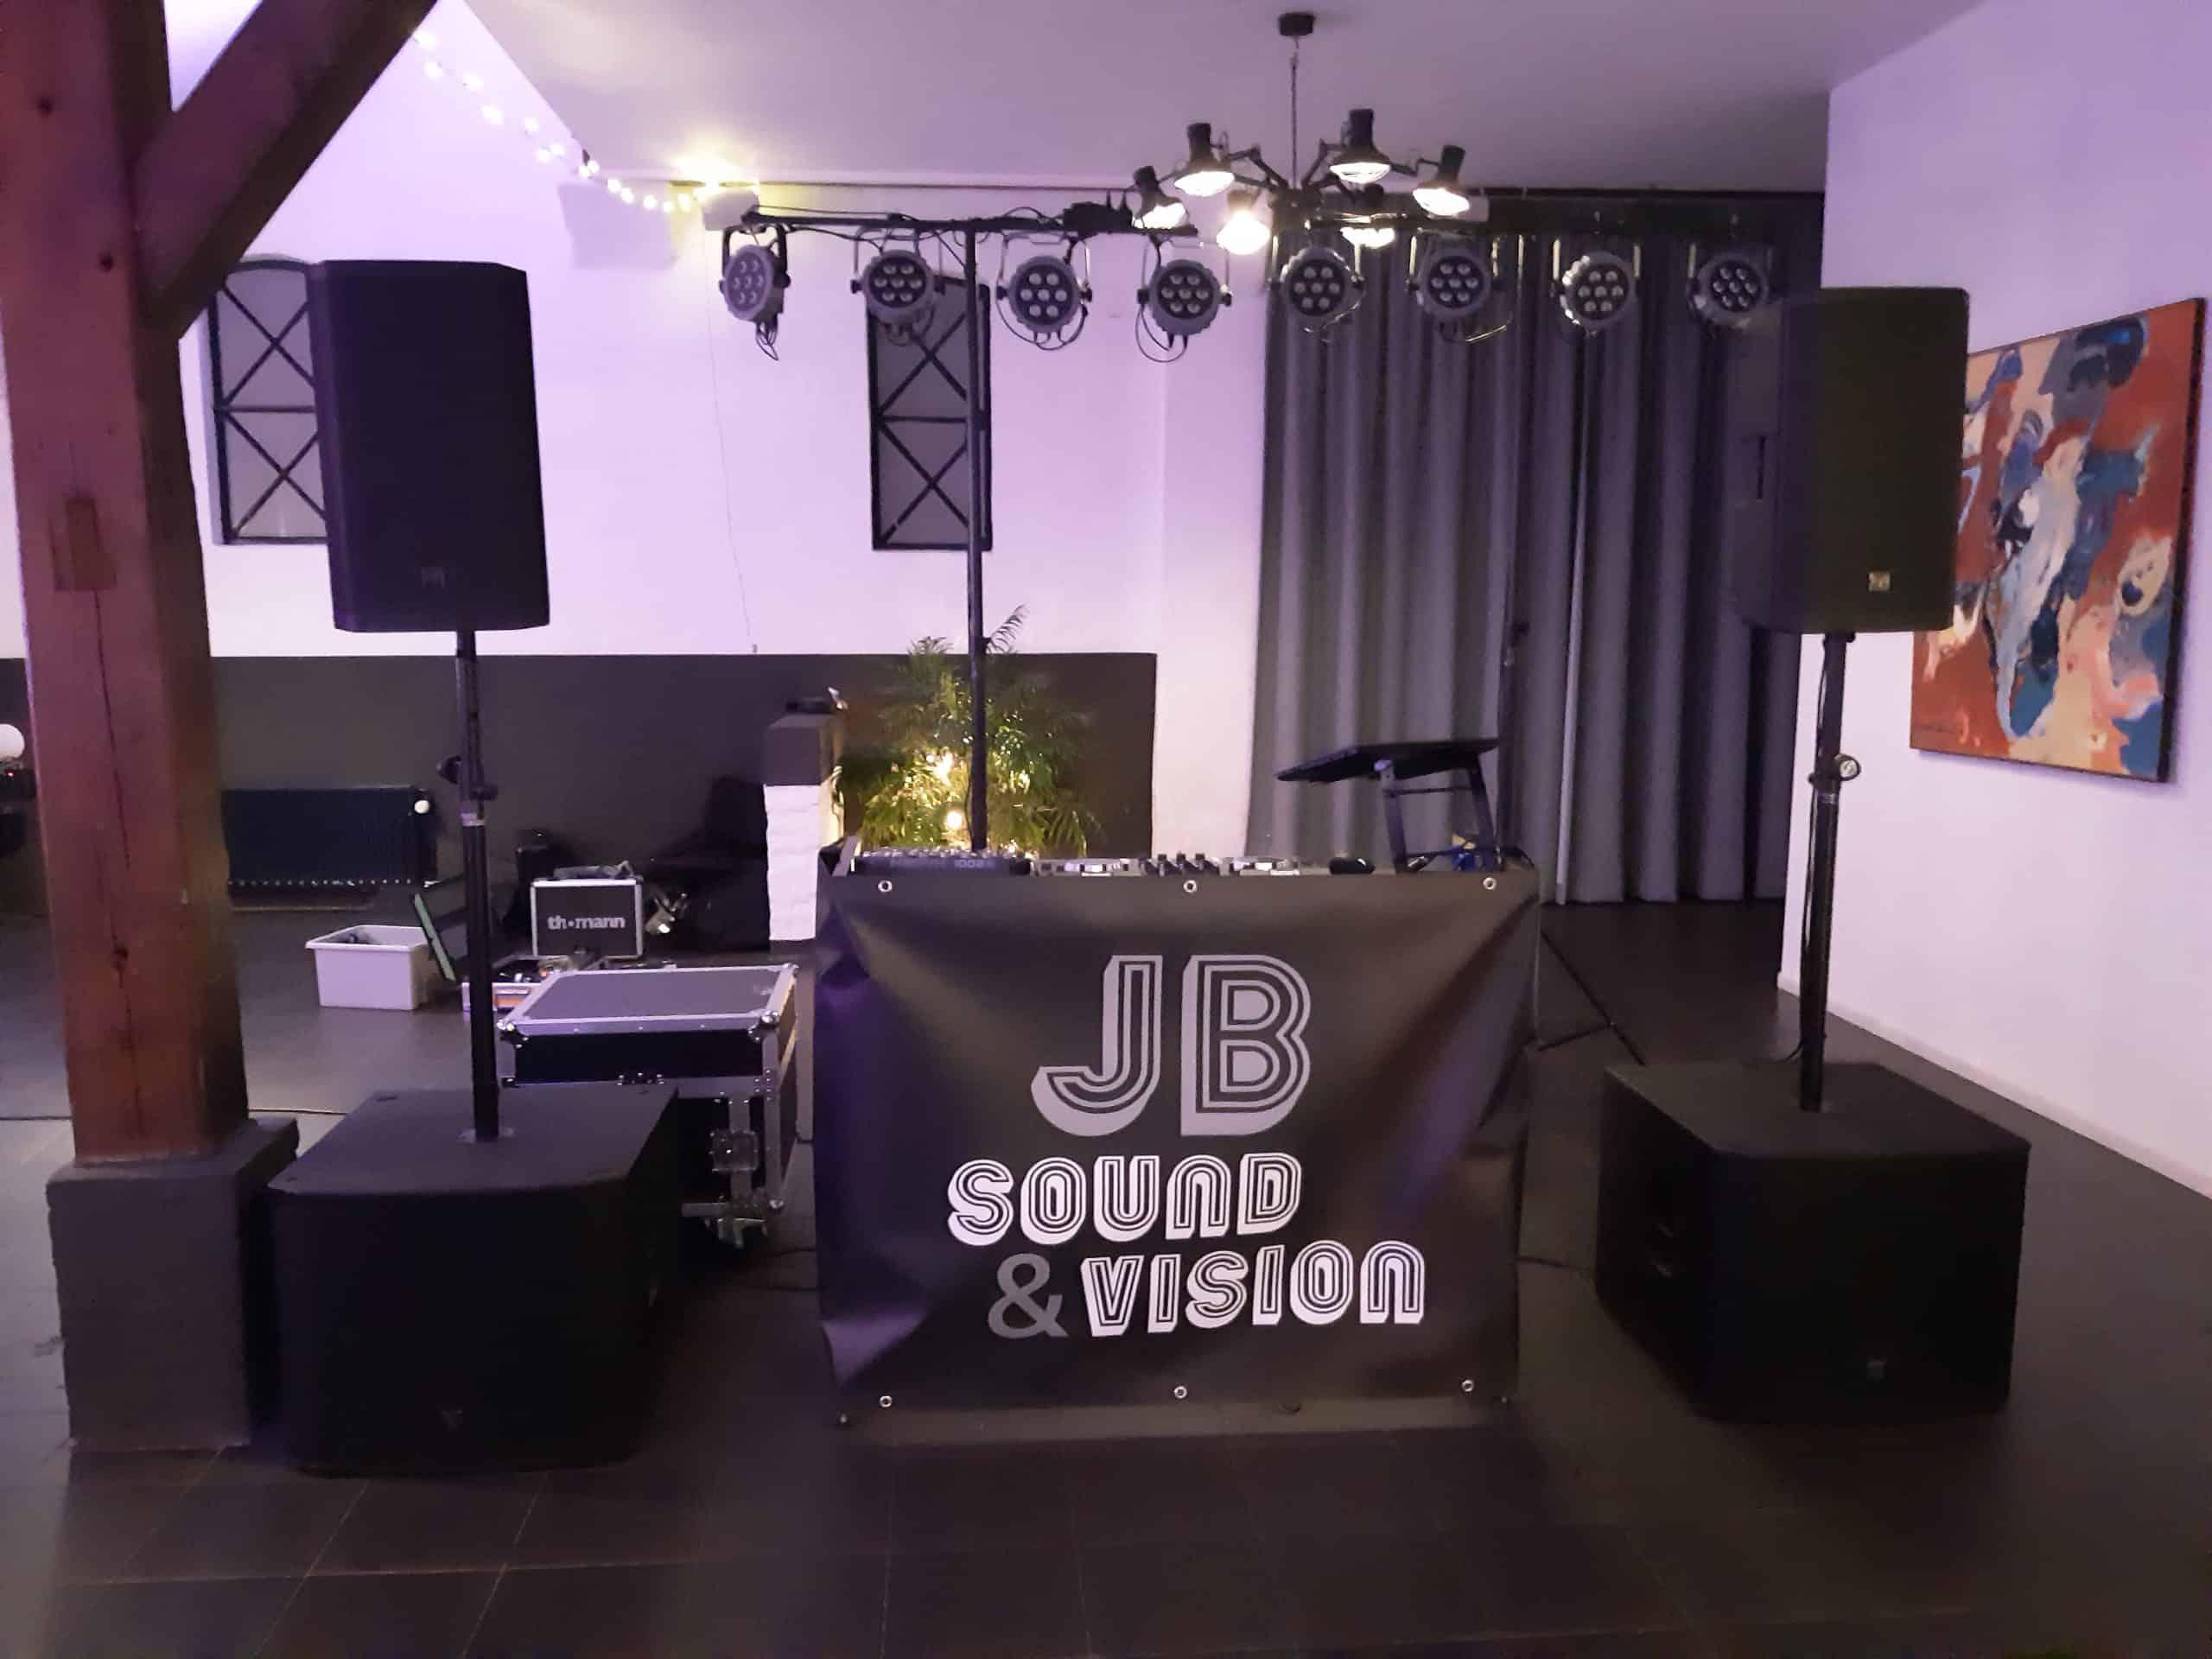 Bruiloft DJ huren Almelo